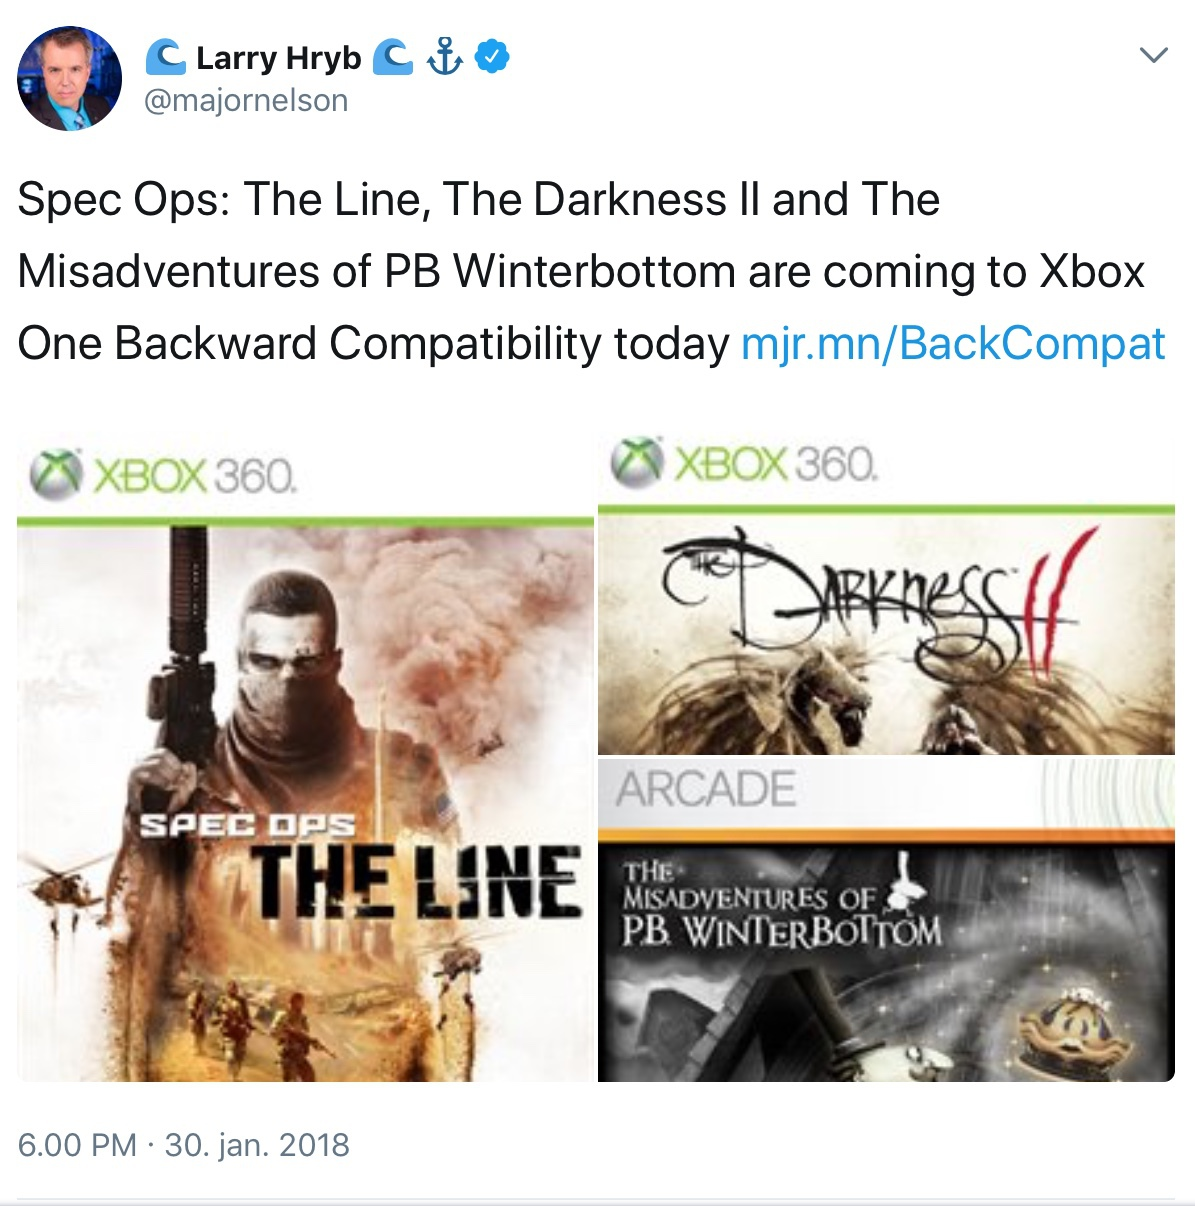 Xbox One bagudkompatibilitet